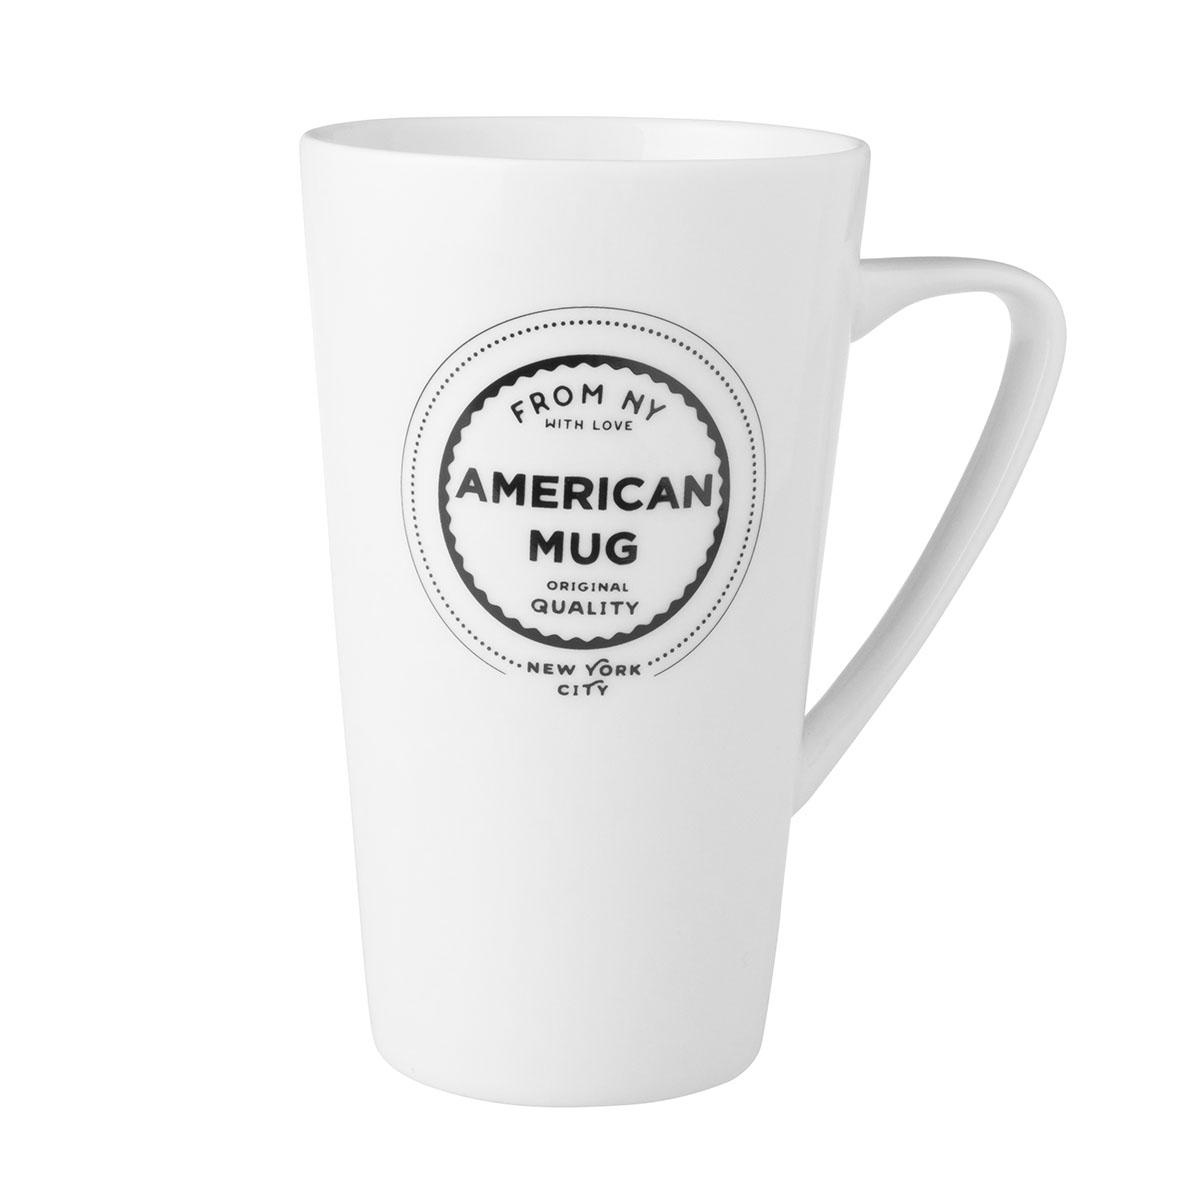 Dutch Rose Zwart-Wit Beker XXL From NY American Mug 51 cl